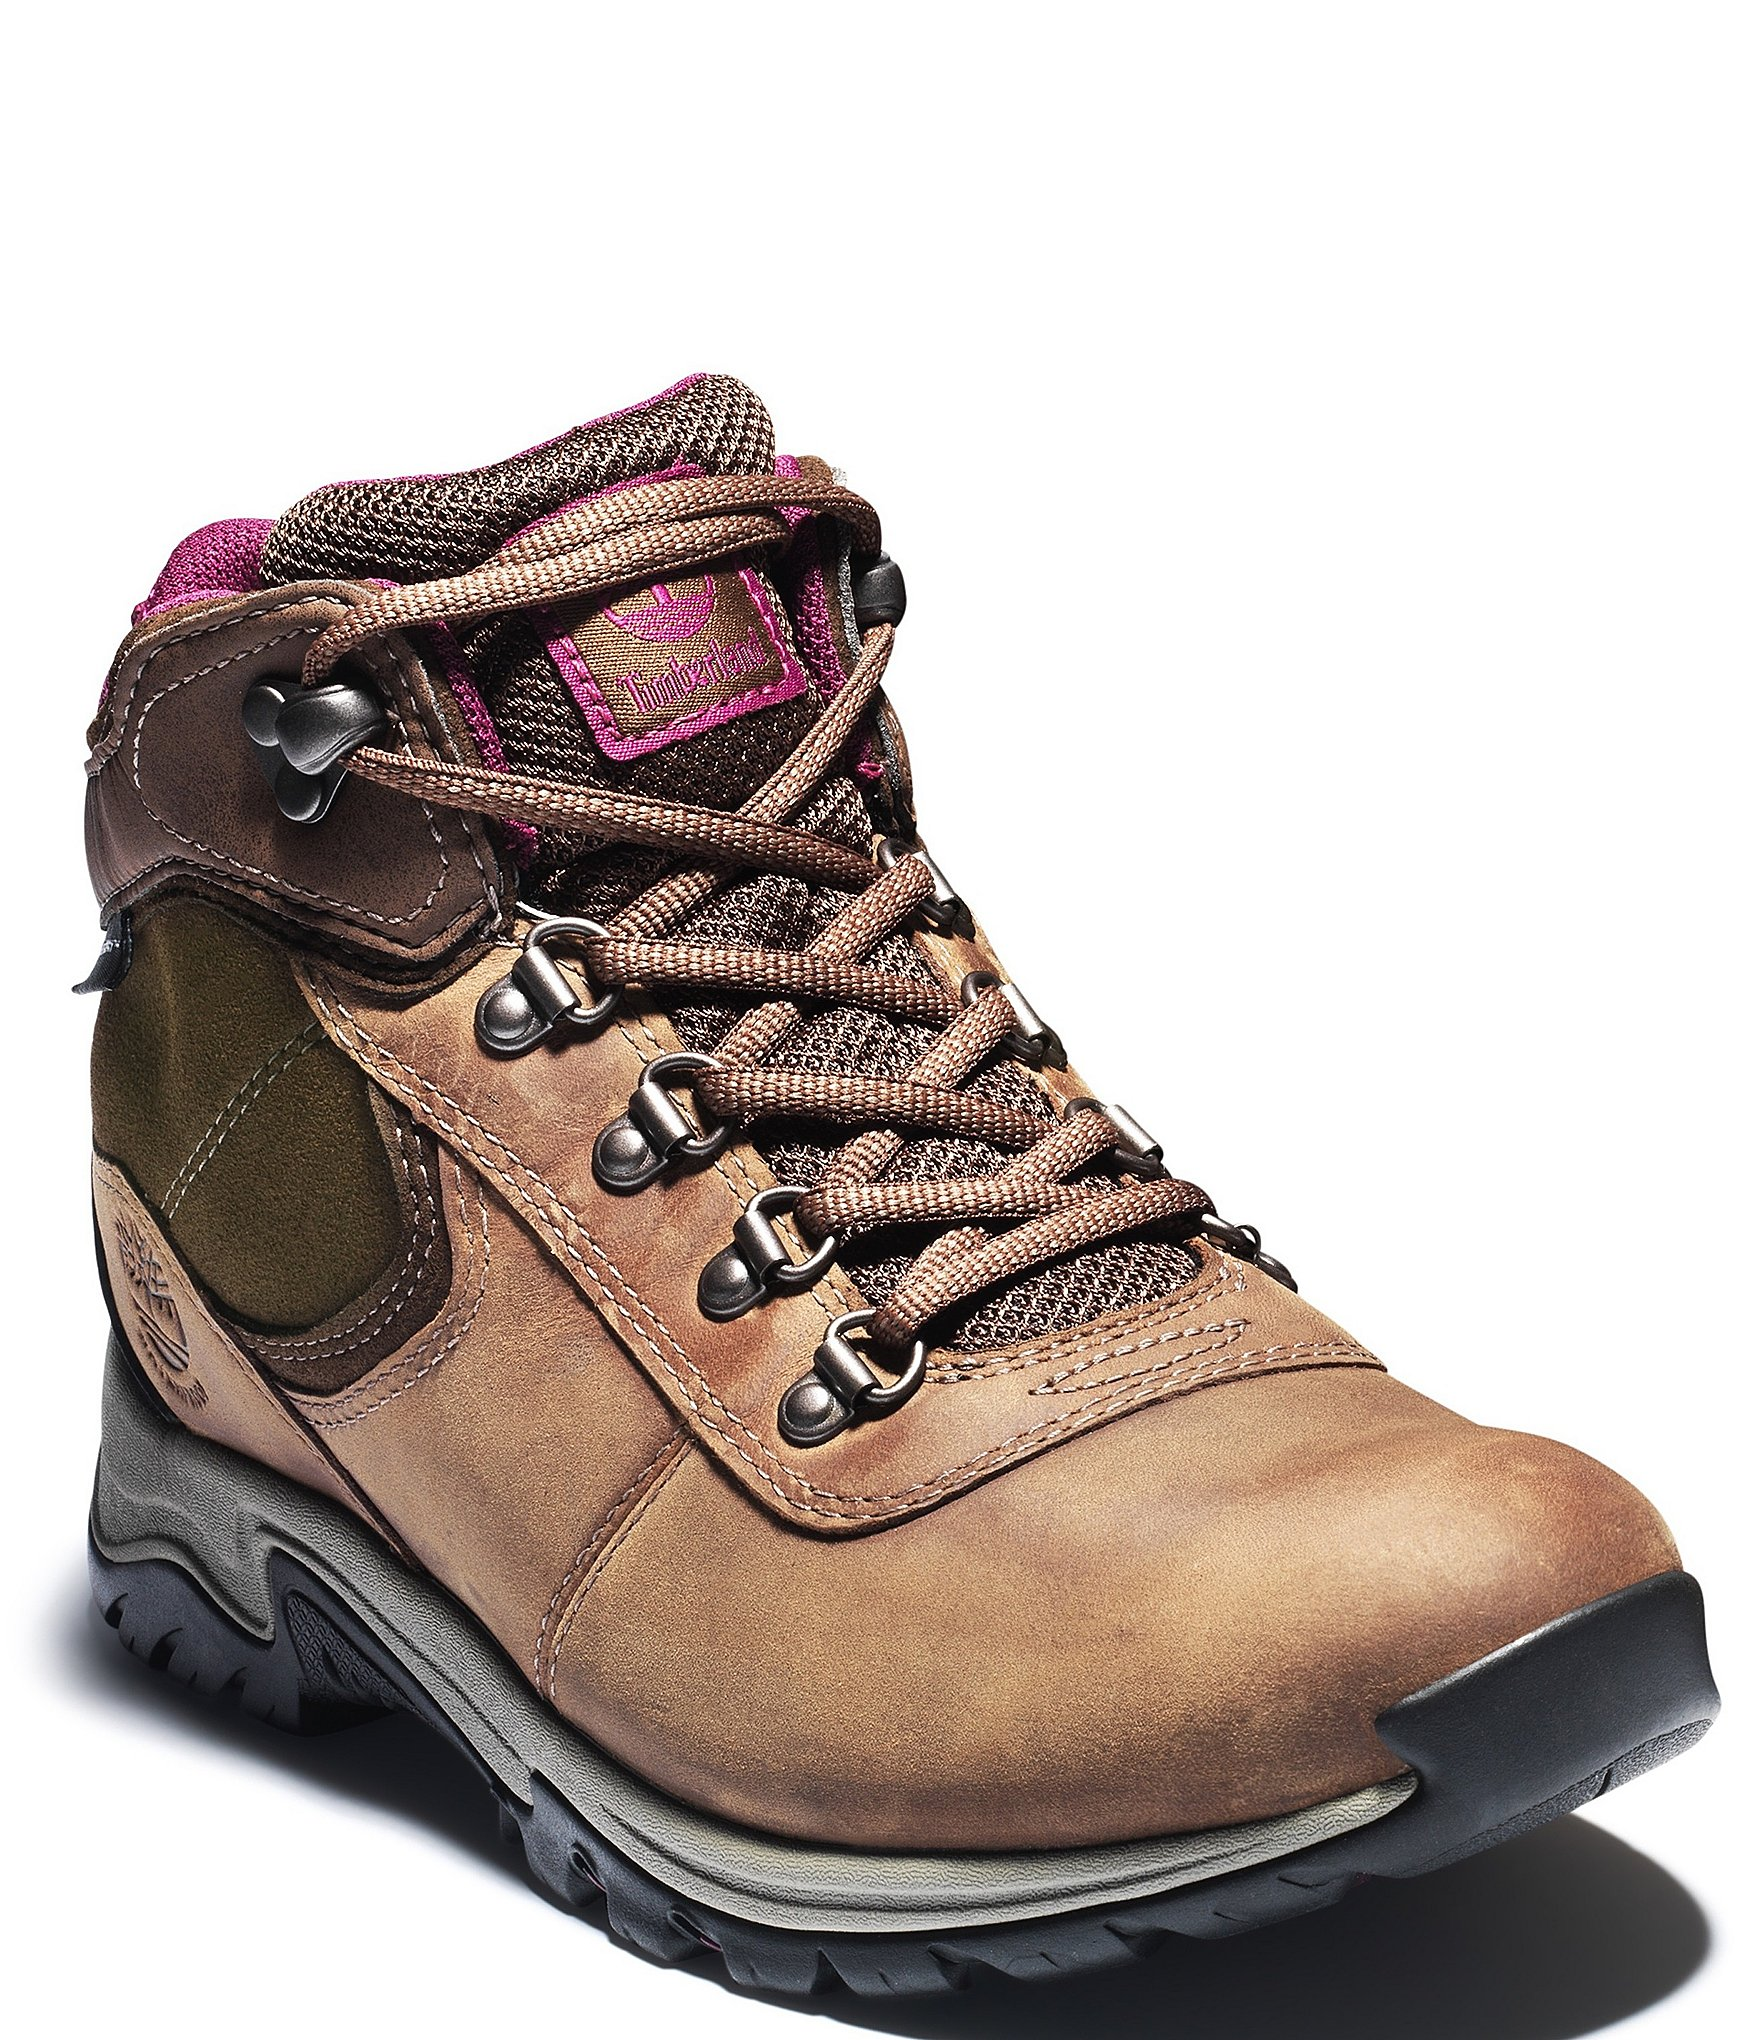 c103ec57667 Timberland Women s Mt Maddsen Mid Waterproof Hiking Boots